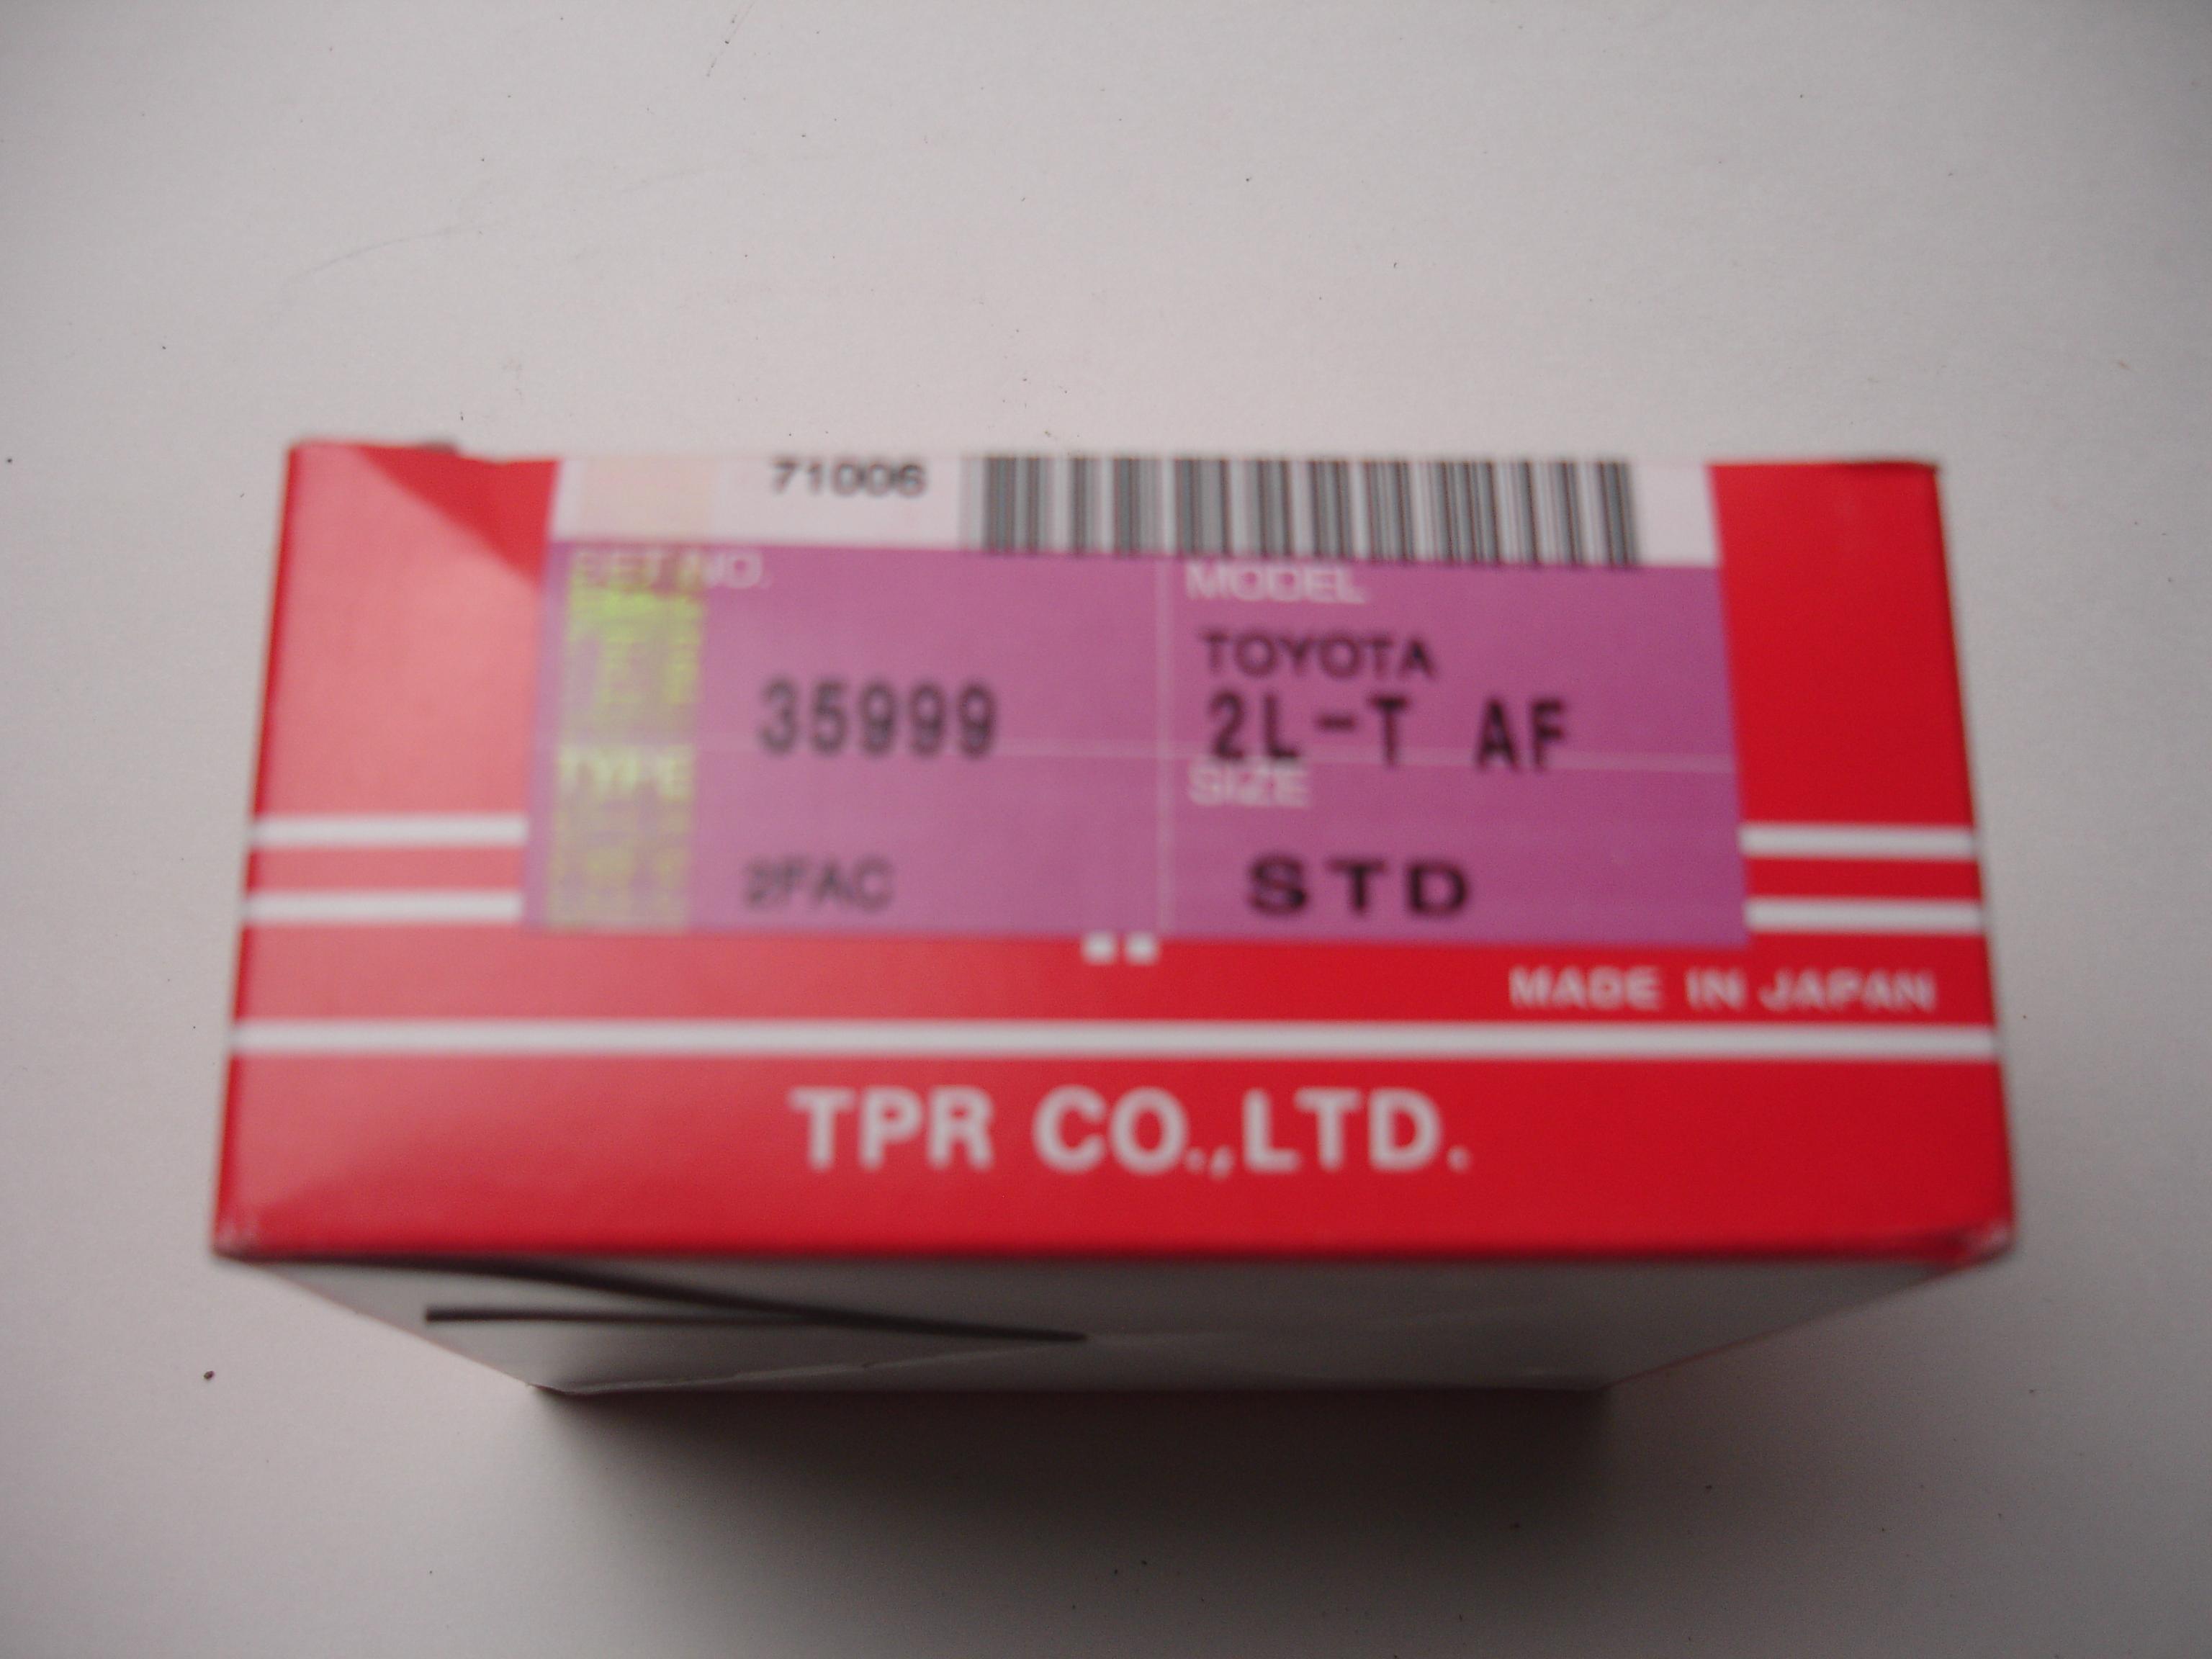 TP Rings 35999 2L-T 2L-TE